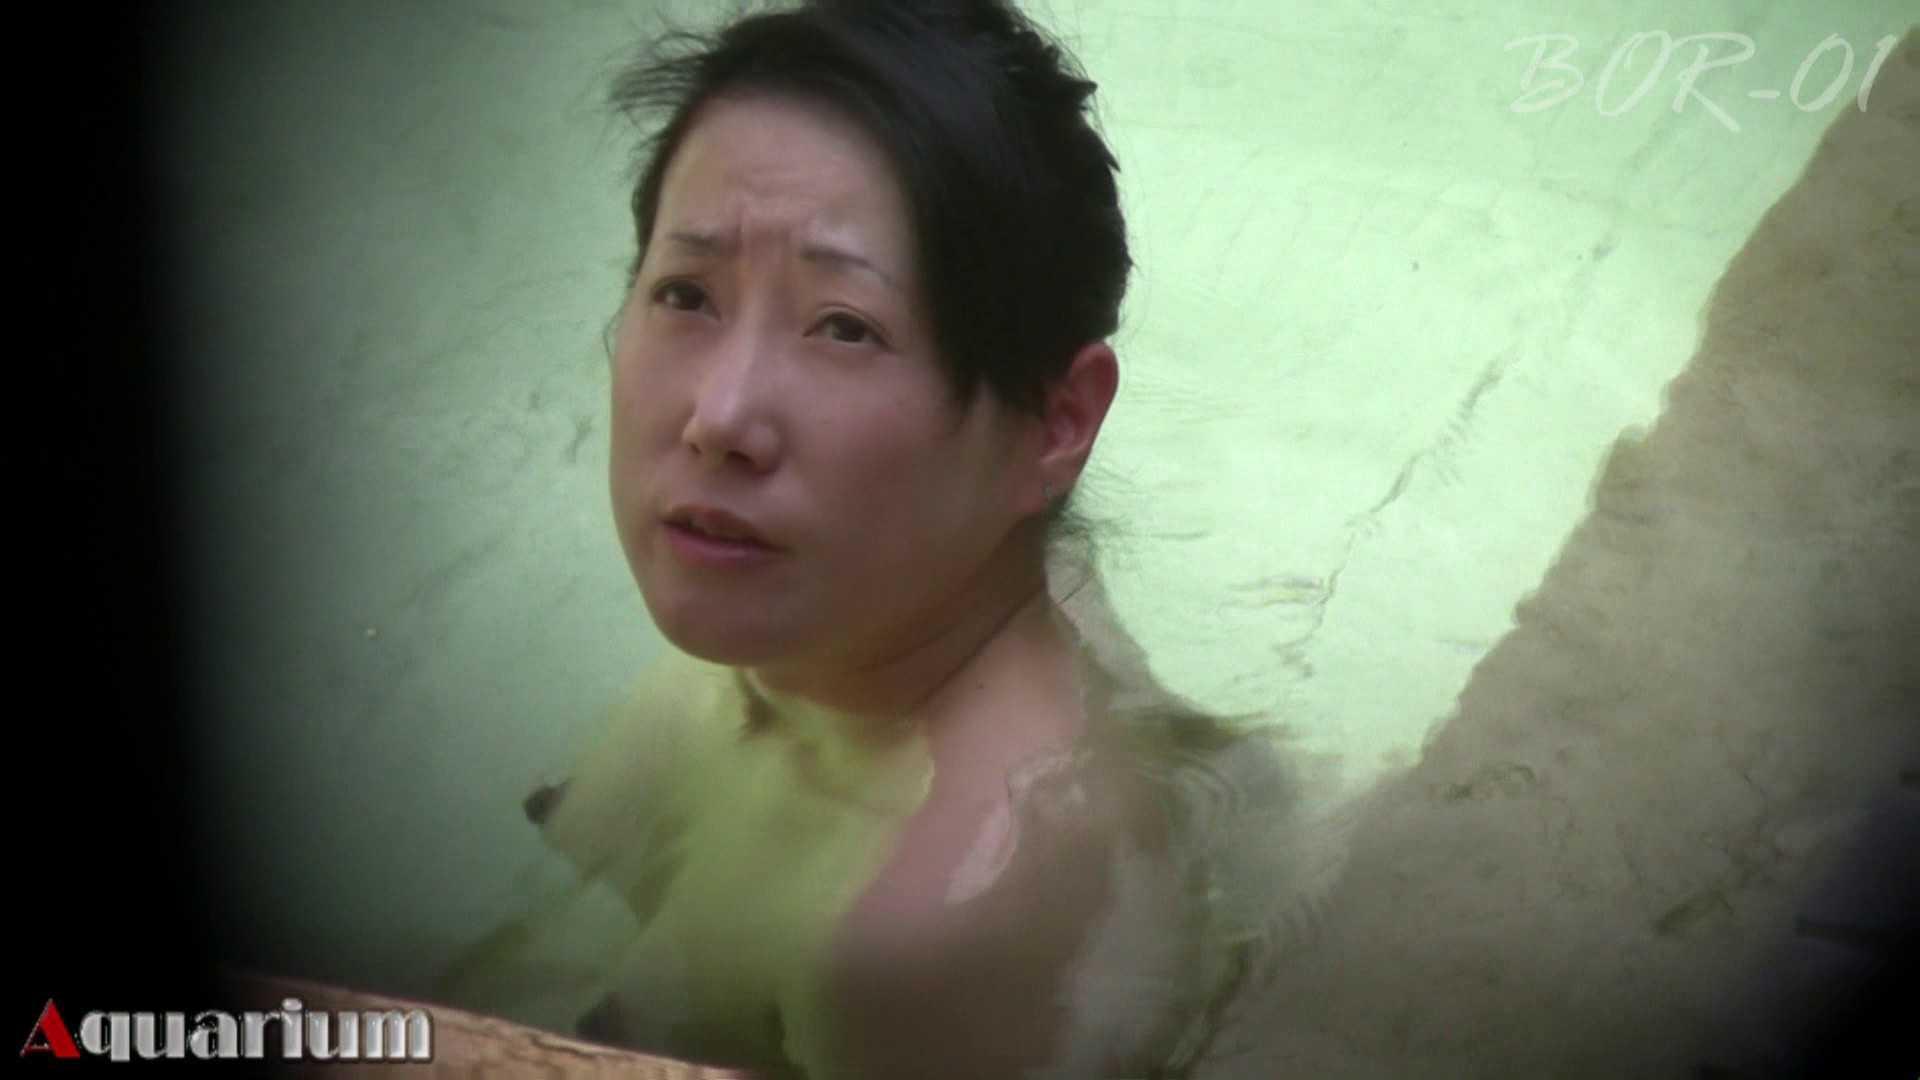 Aquaな露天風呂Vol.461 エッチな盗撮 AV無料動画キャプチャ 108pic 31